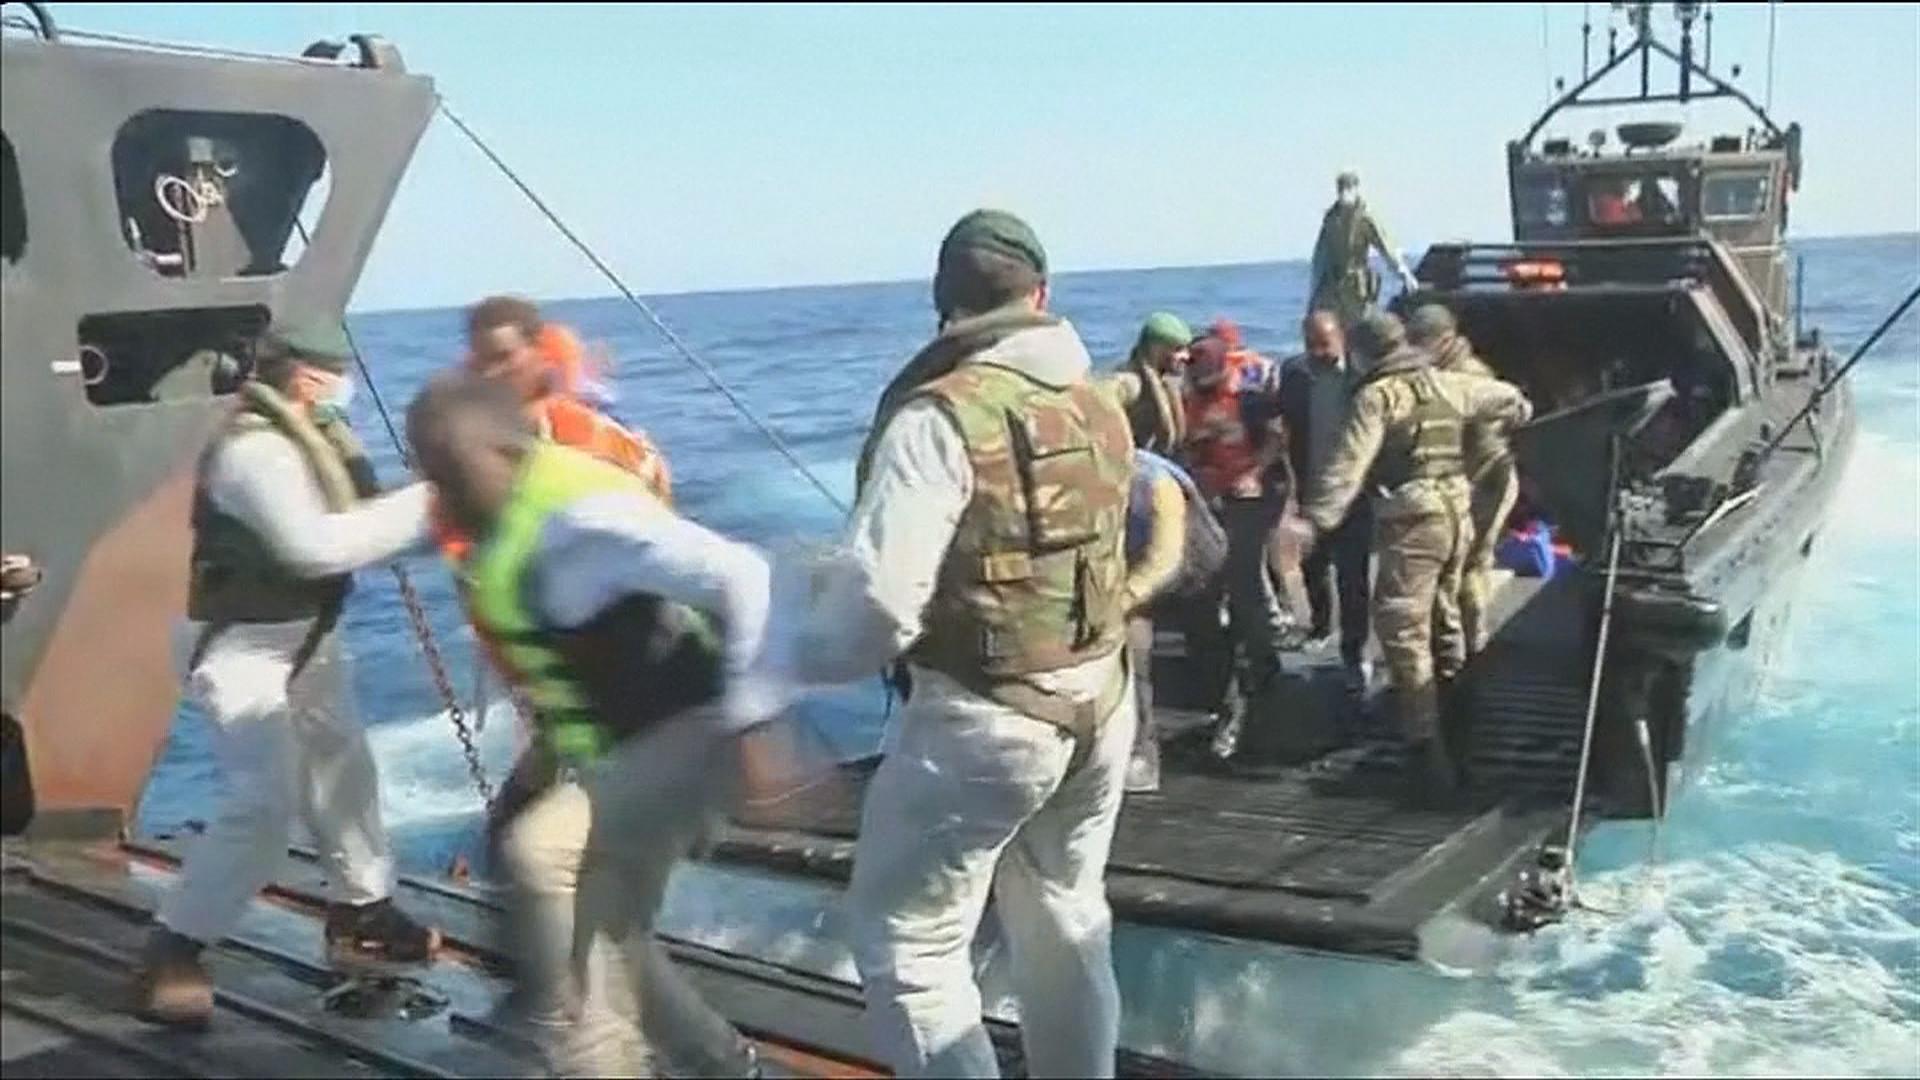 Royal Navy Ship HMS Bulwark Rescues Hundreds of Migrants Off Libyan Coast